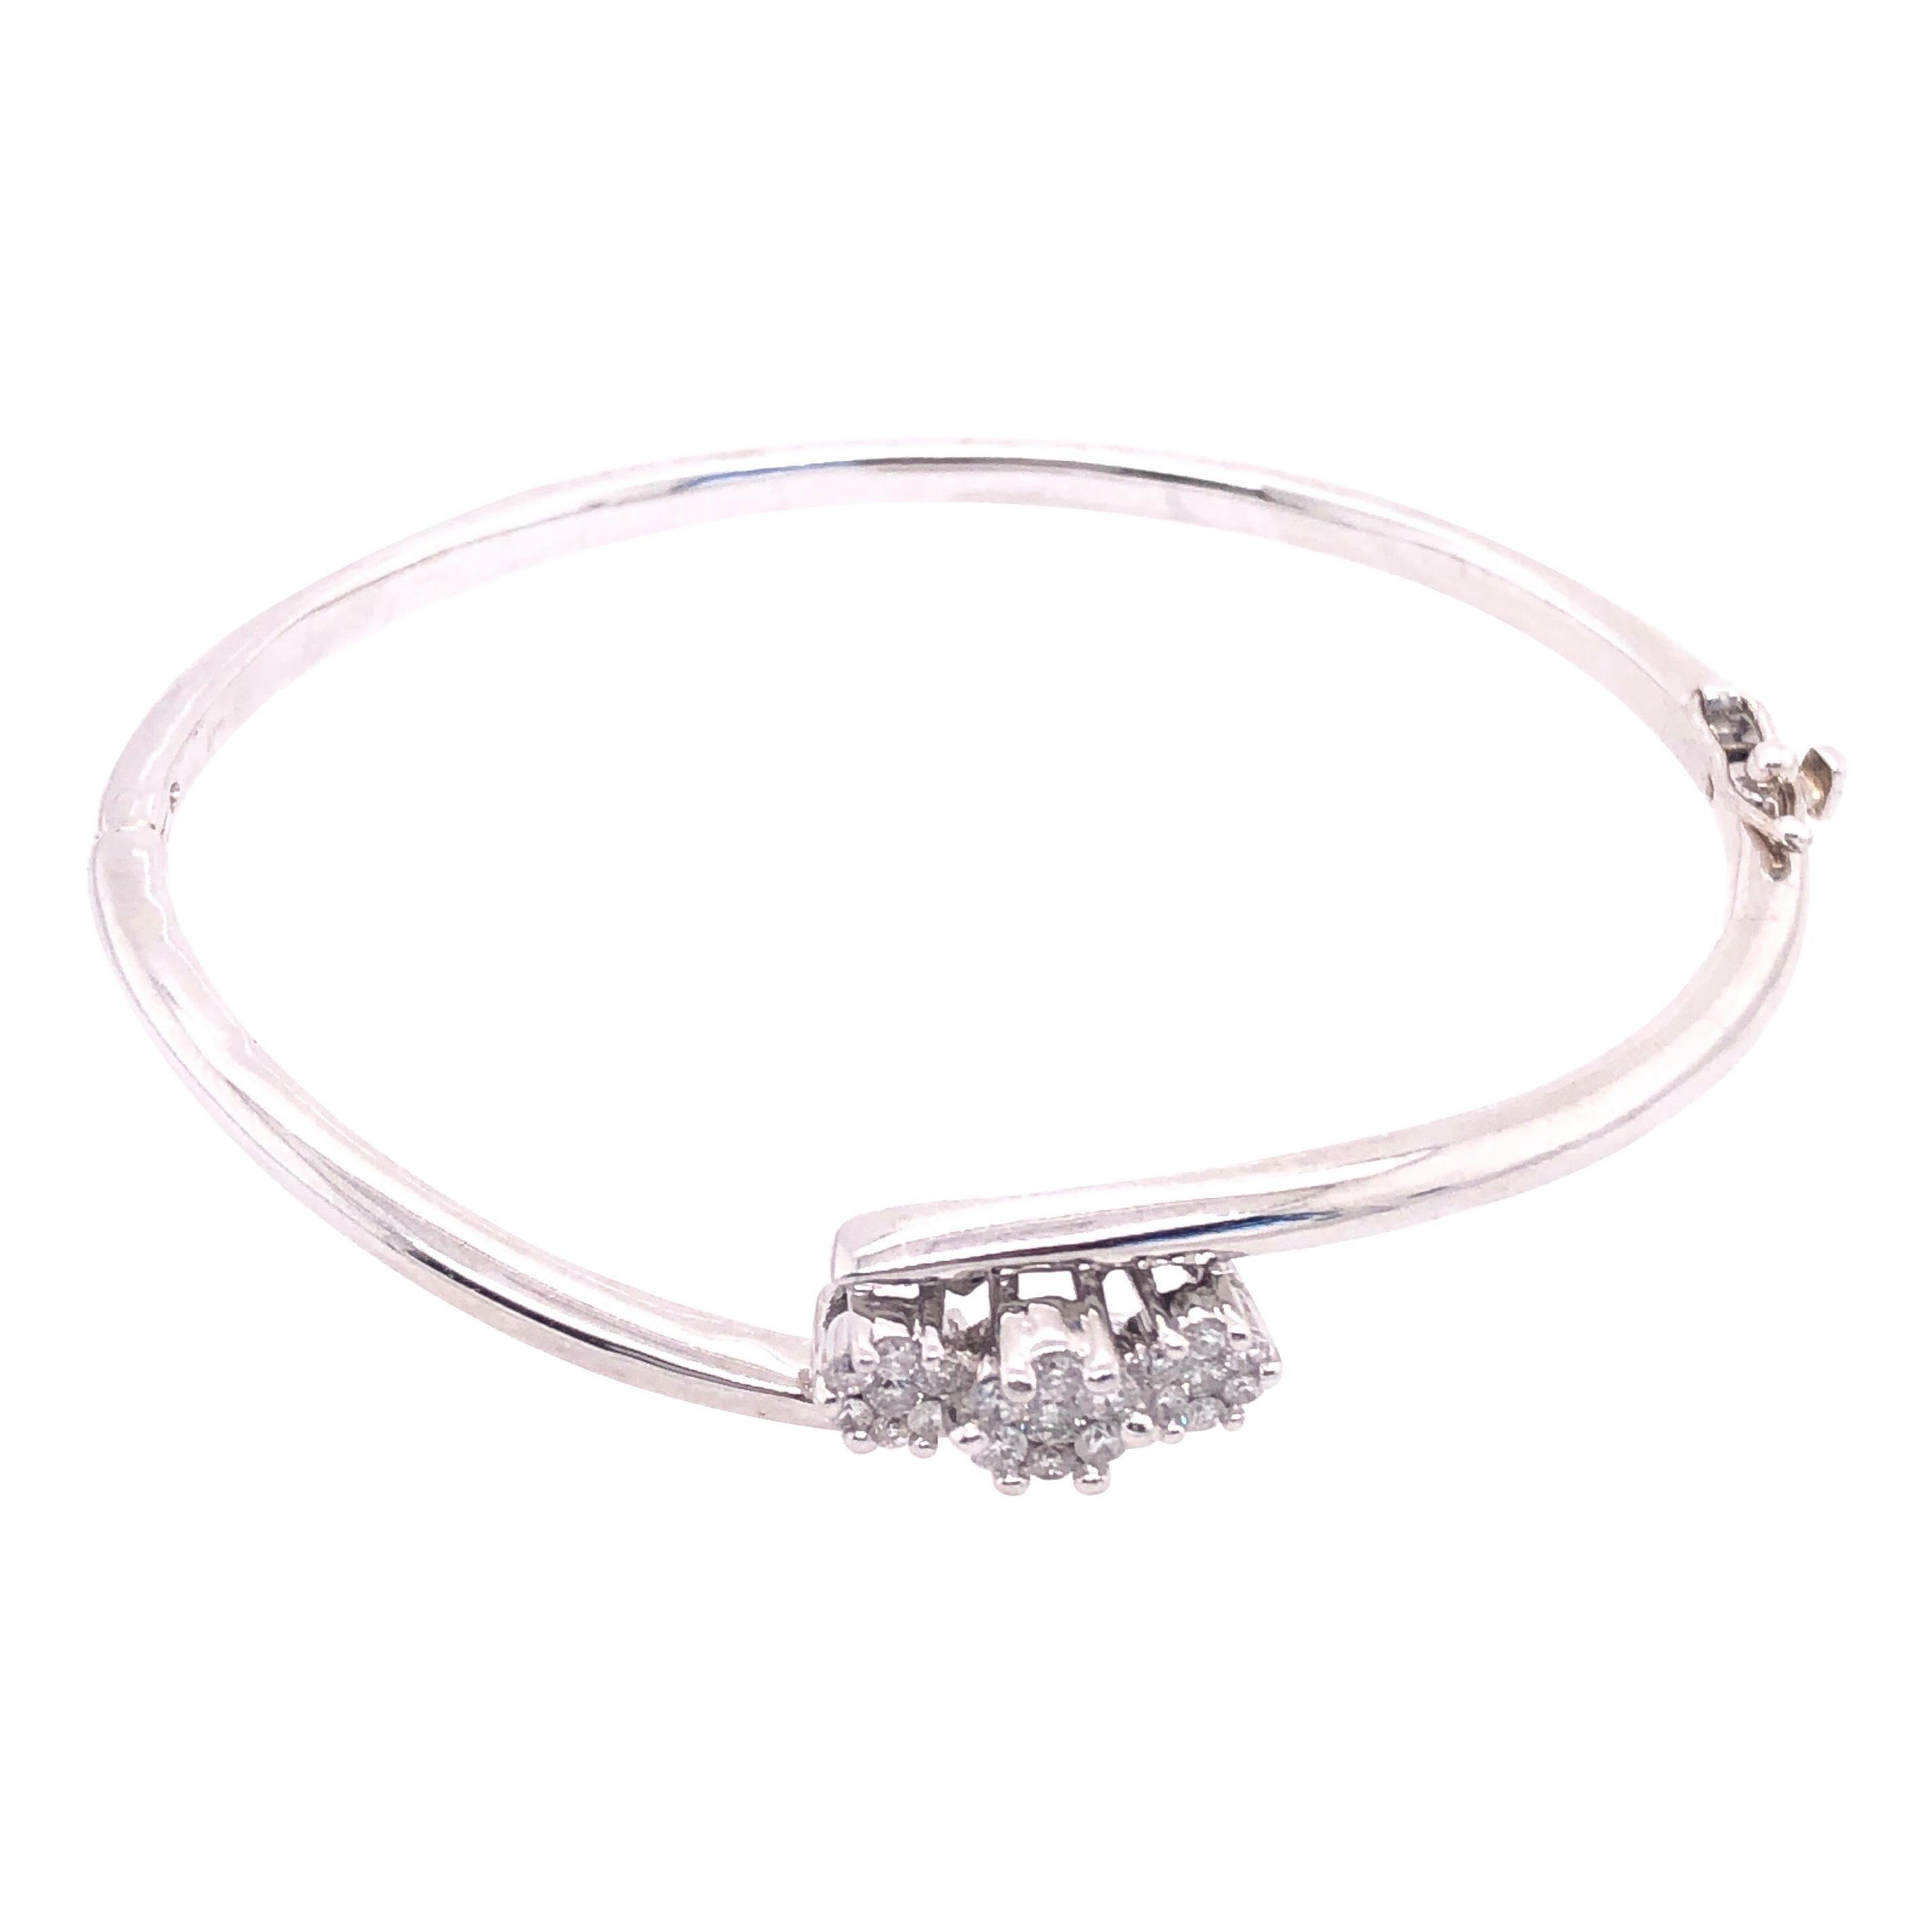 14 Karat White Gold Bangle Bracelet with Three Diamonds